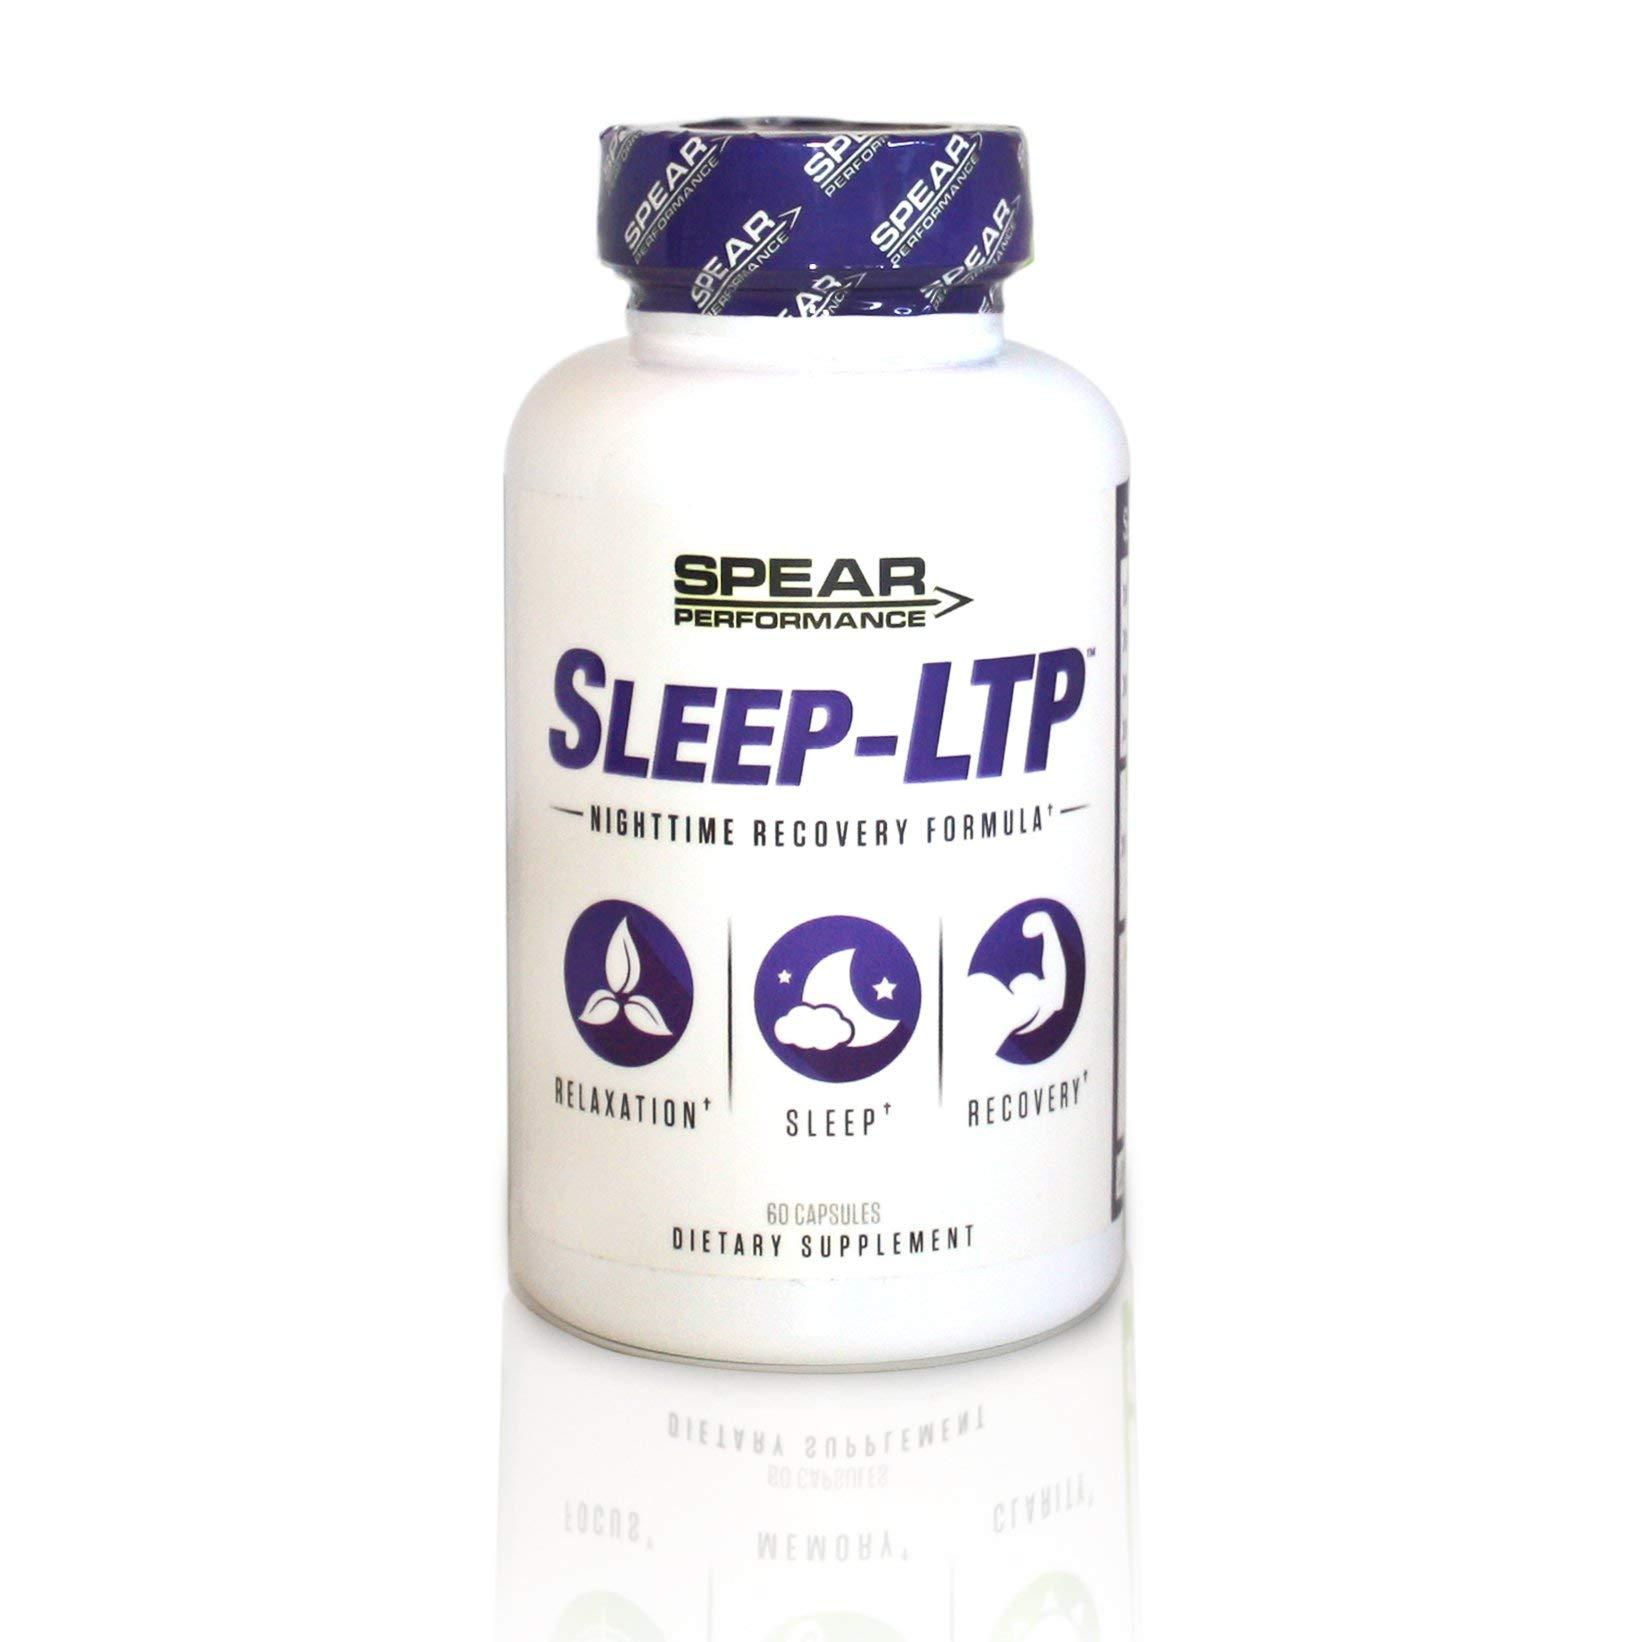 Amazon.com: TerraTest - Premium, Powerful, Natural Testosterone Booster- Boost Stamina, Increase ...